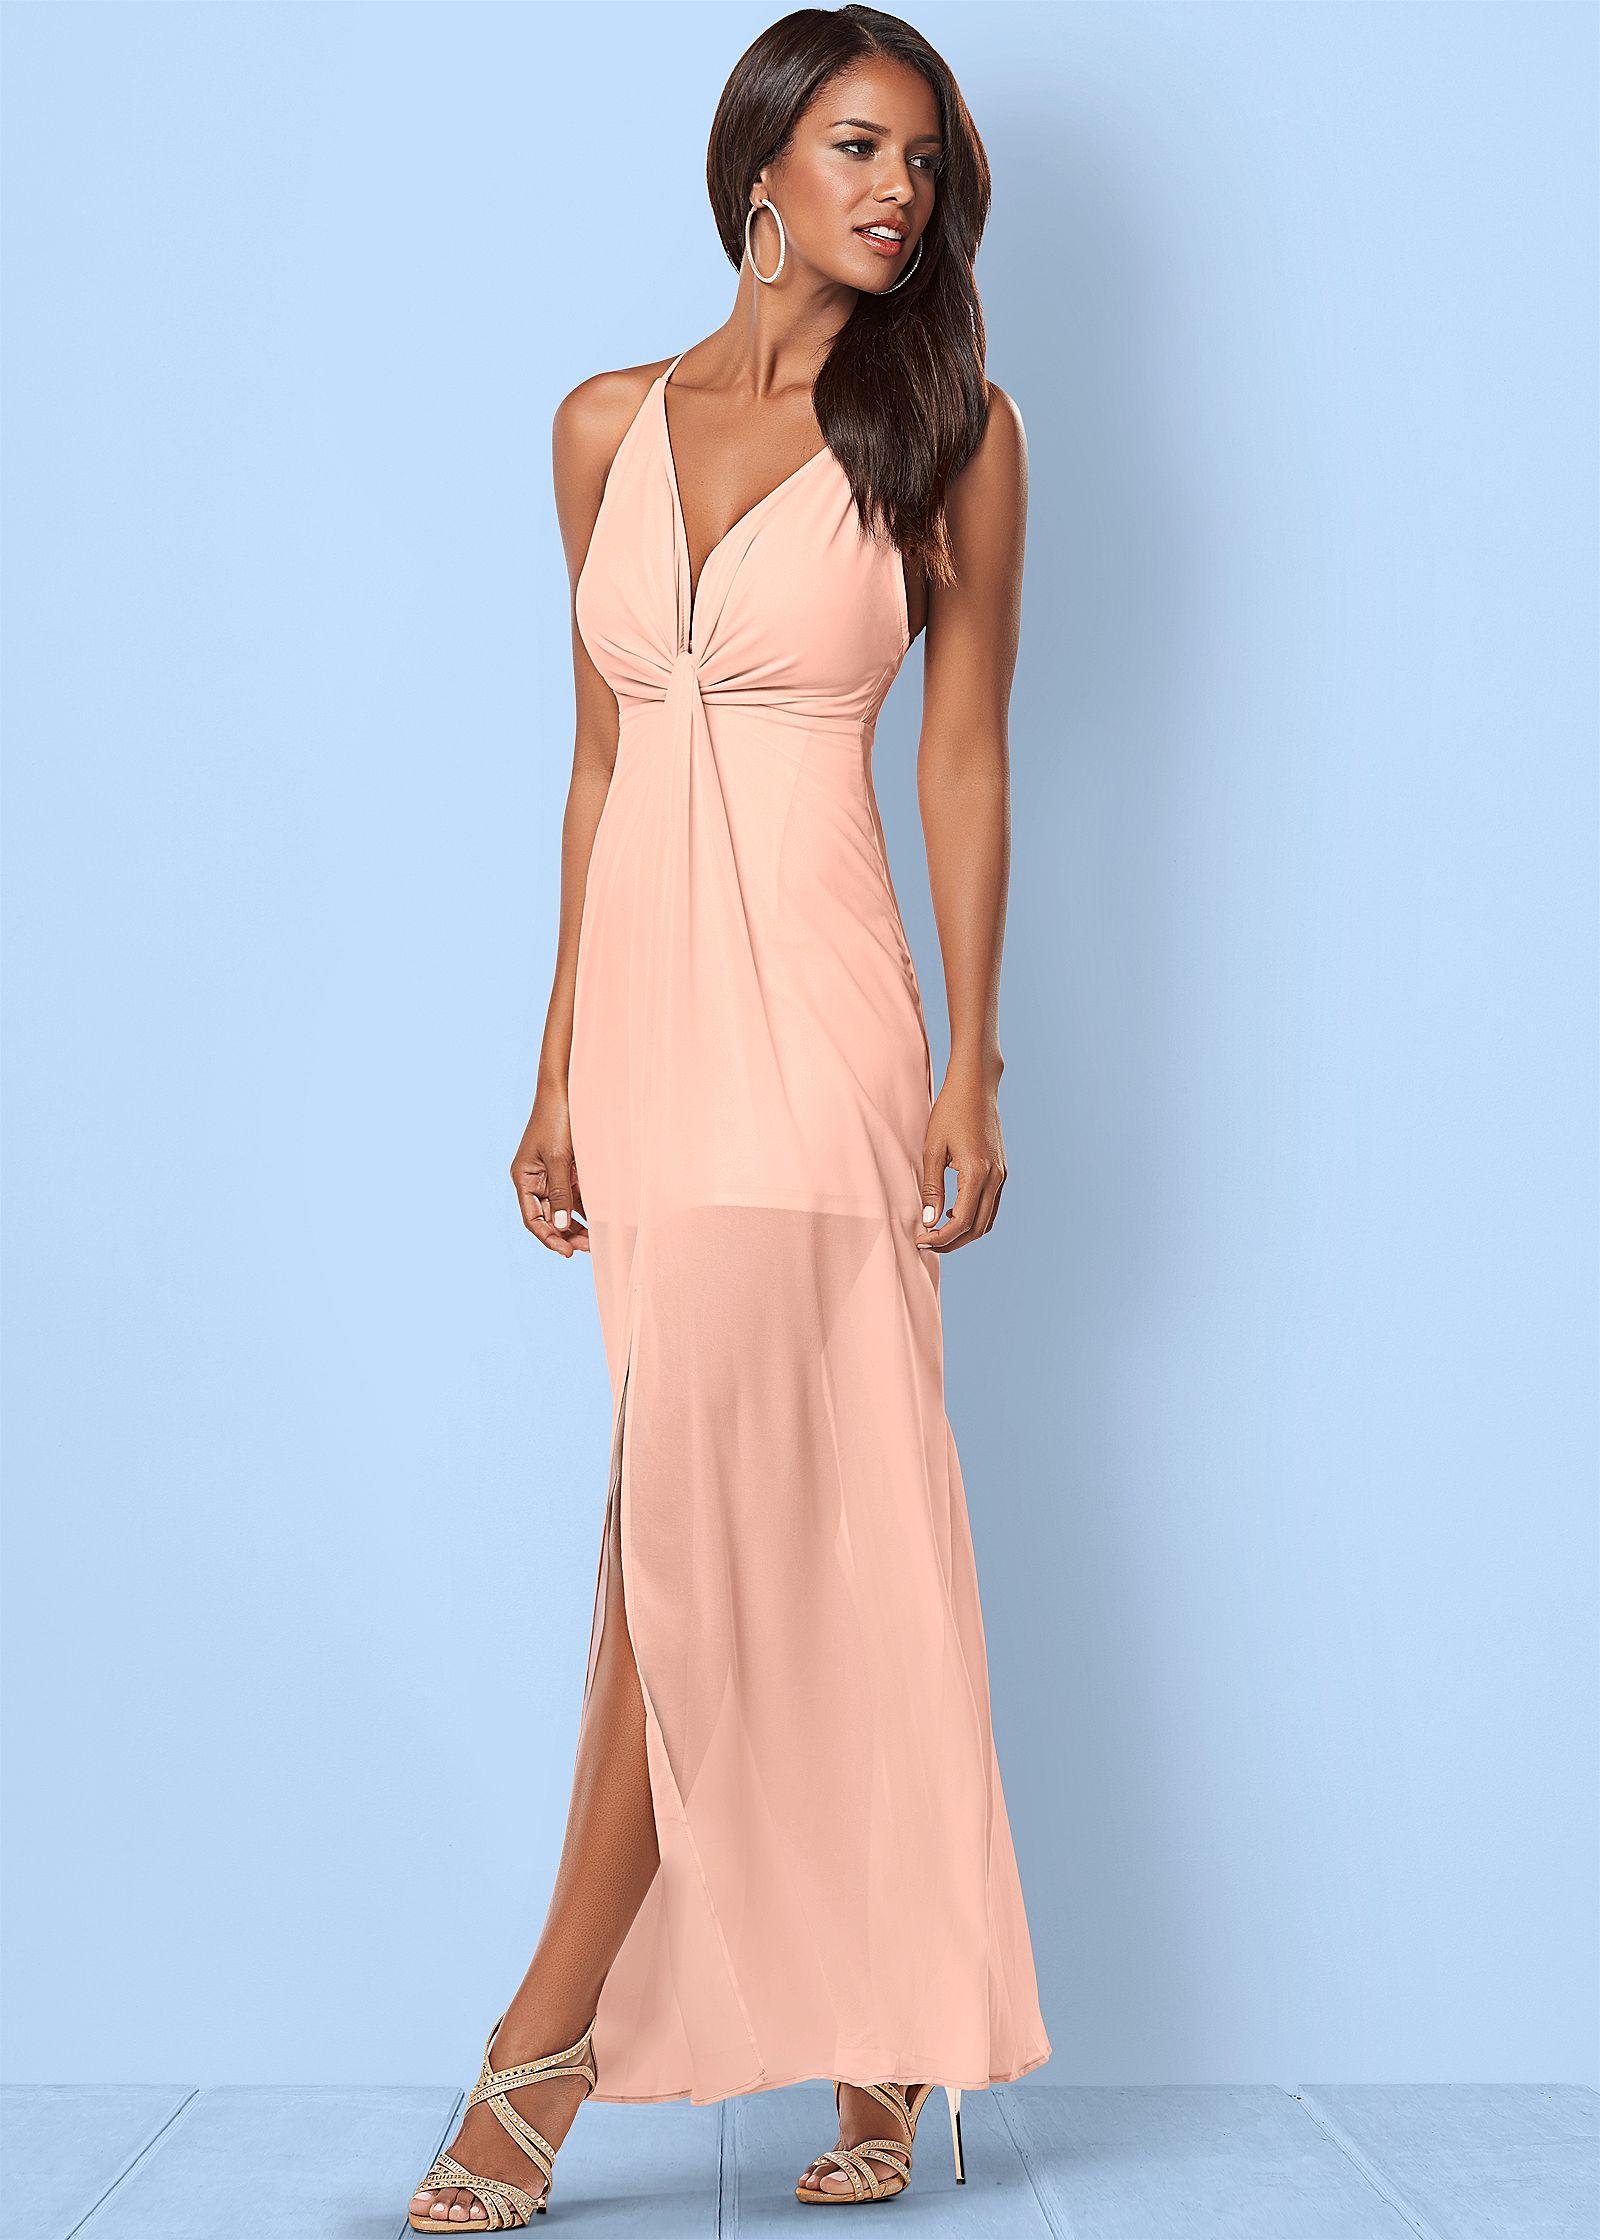 Pink Long Dresses